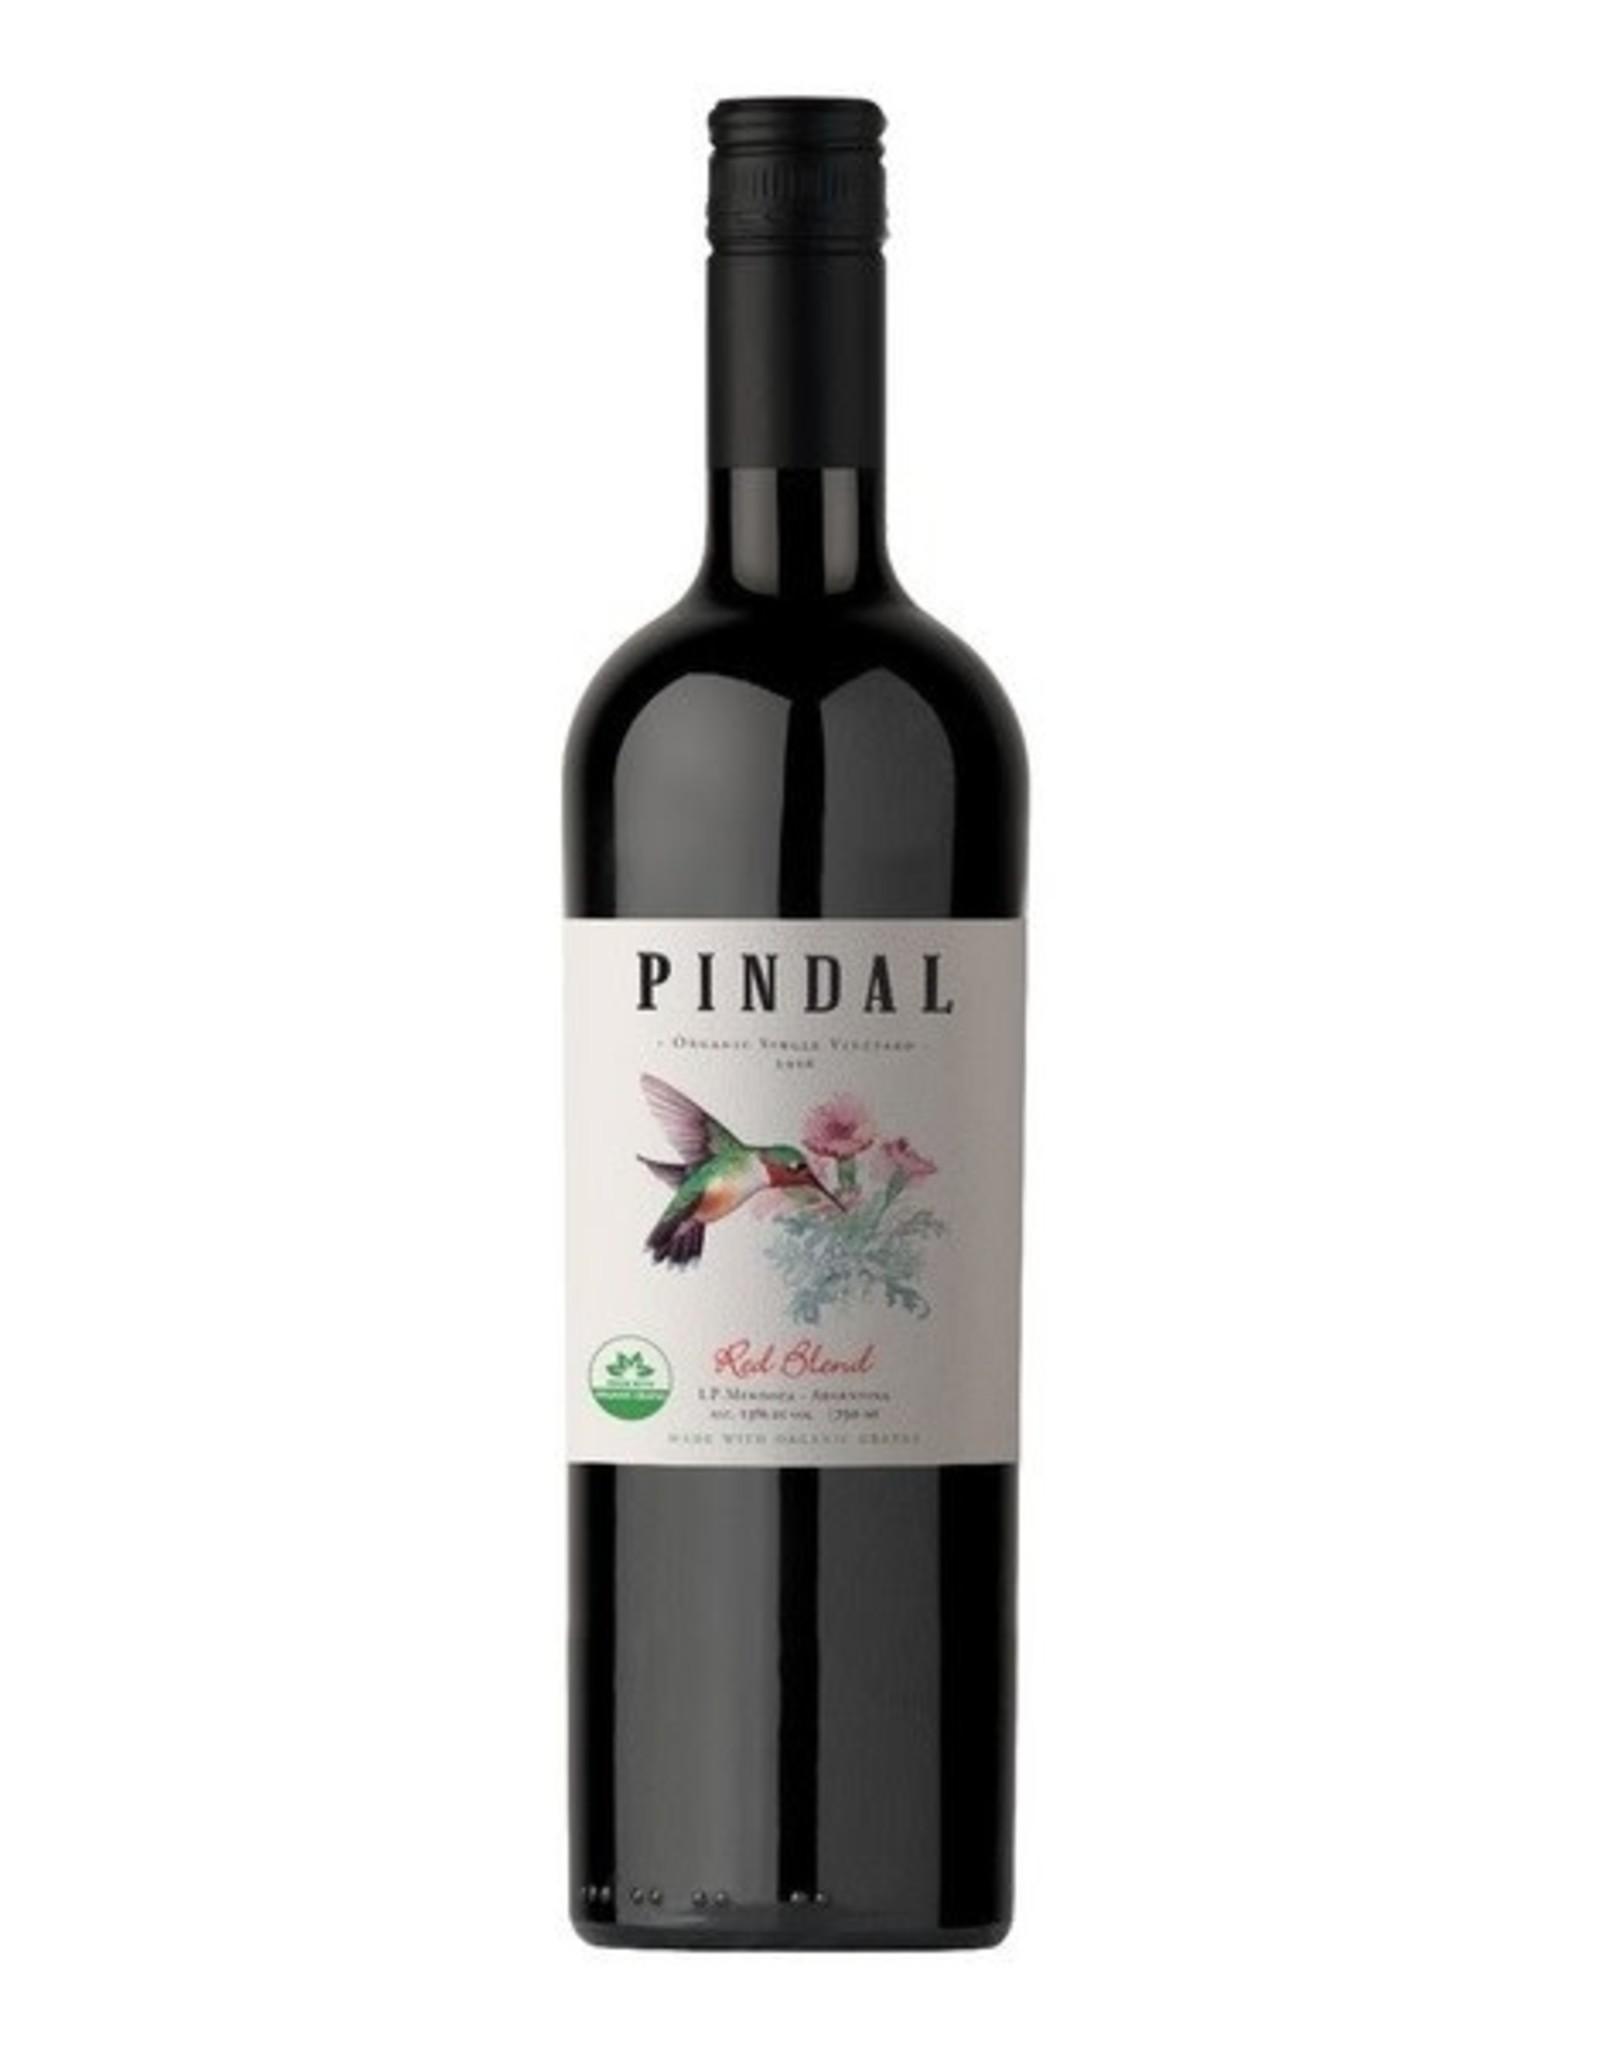 Argentina Pindal Organic Red Blend